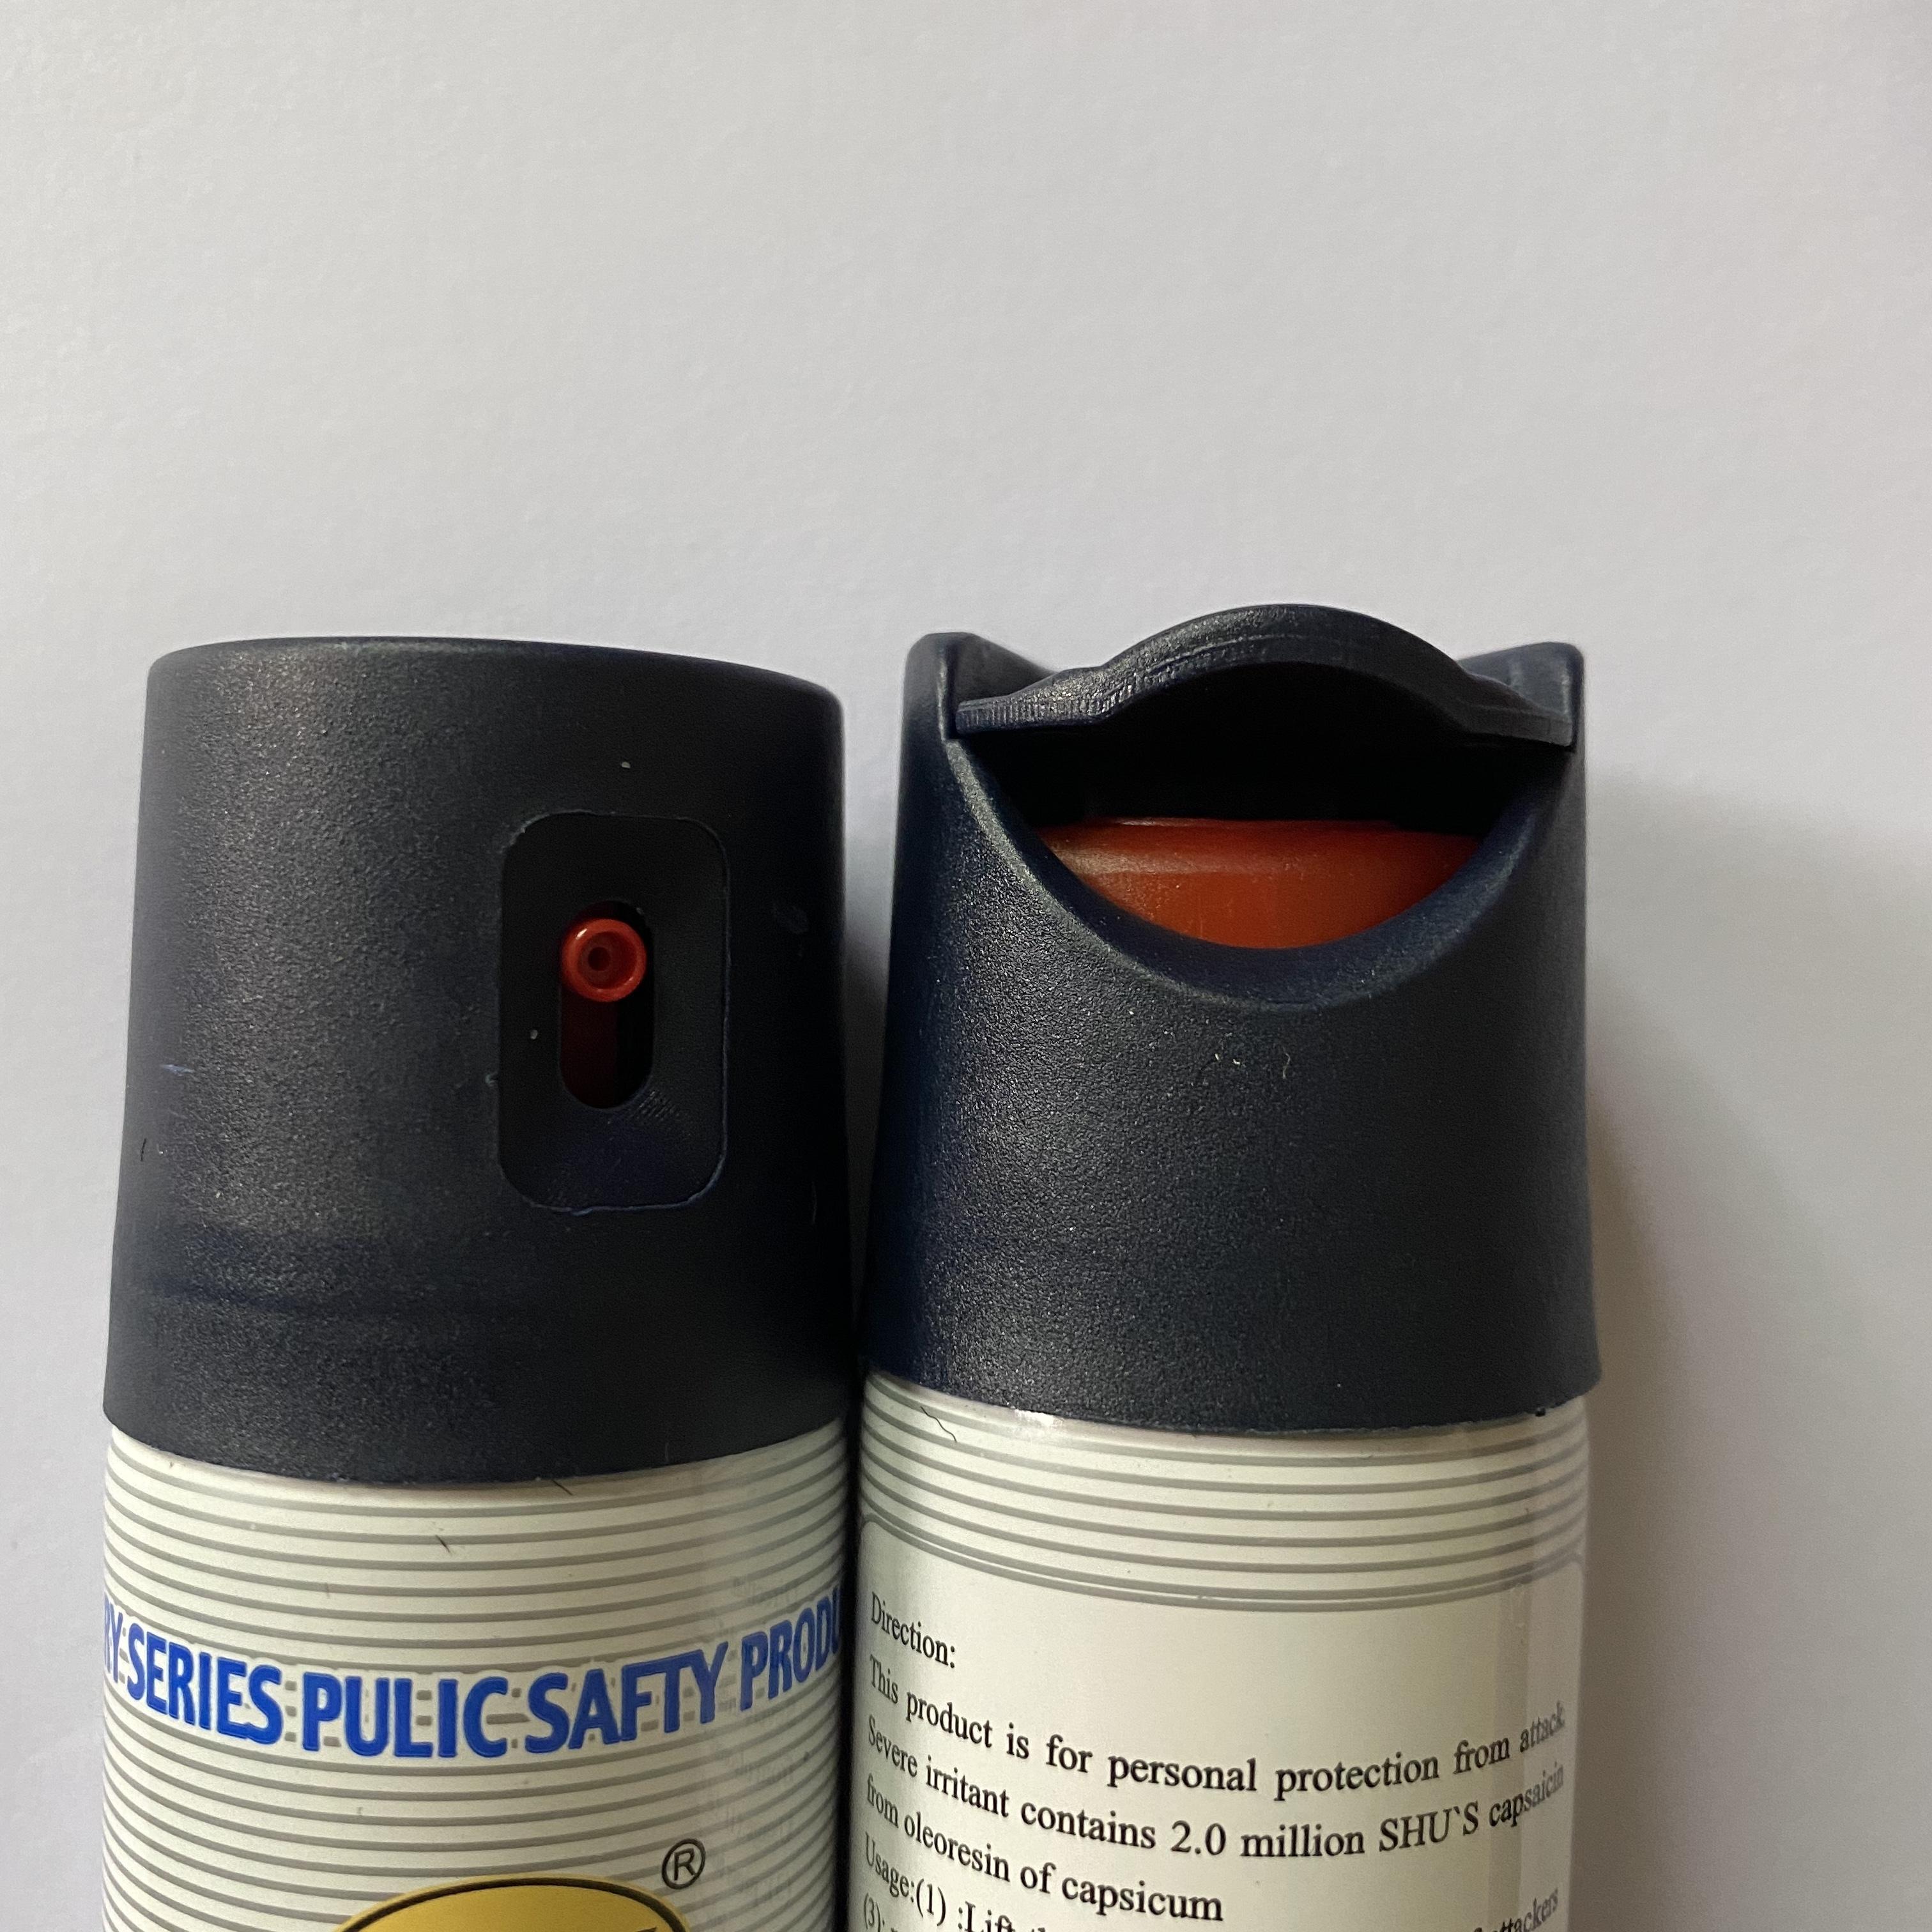 RY-88防狼喷雾(射流)_国产RY喷雾